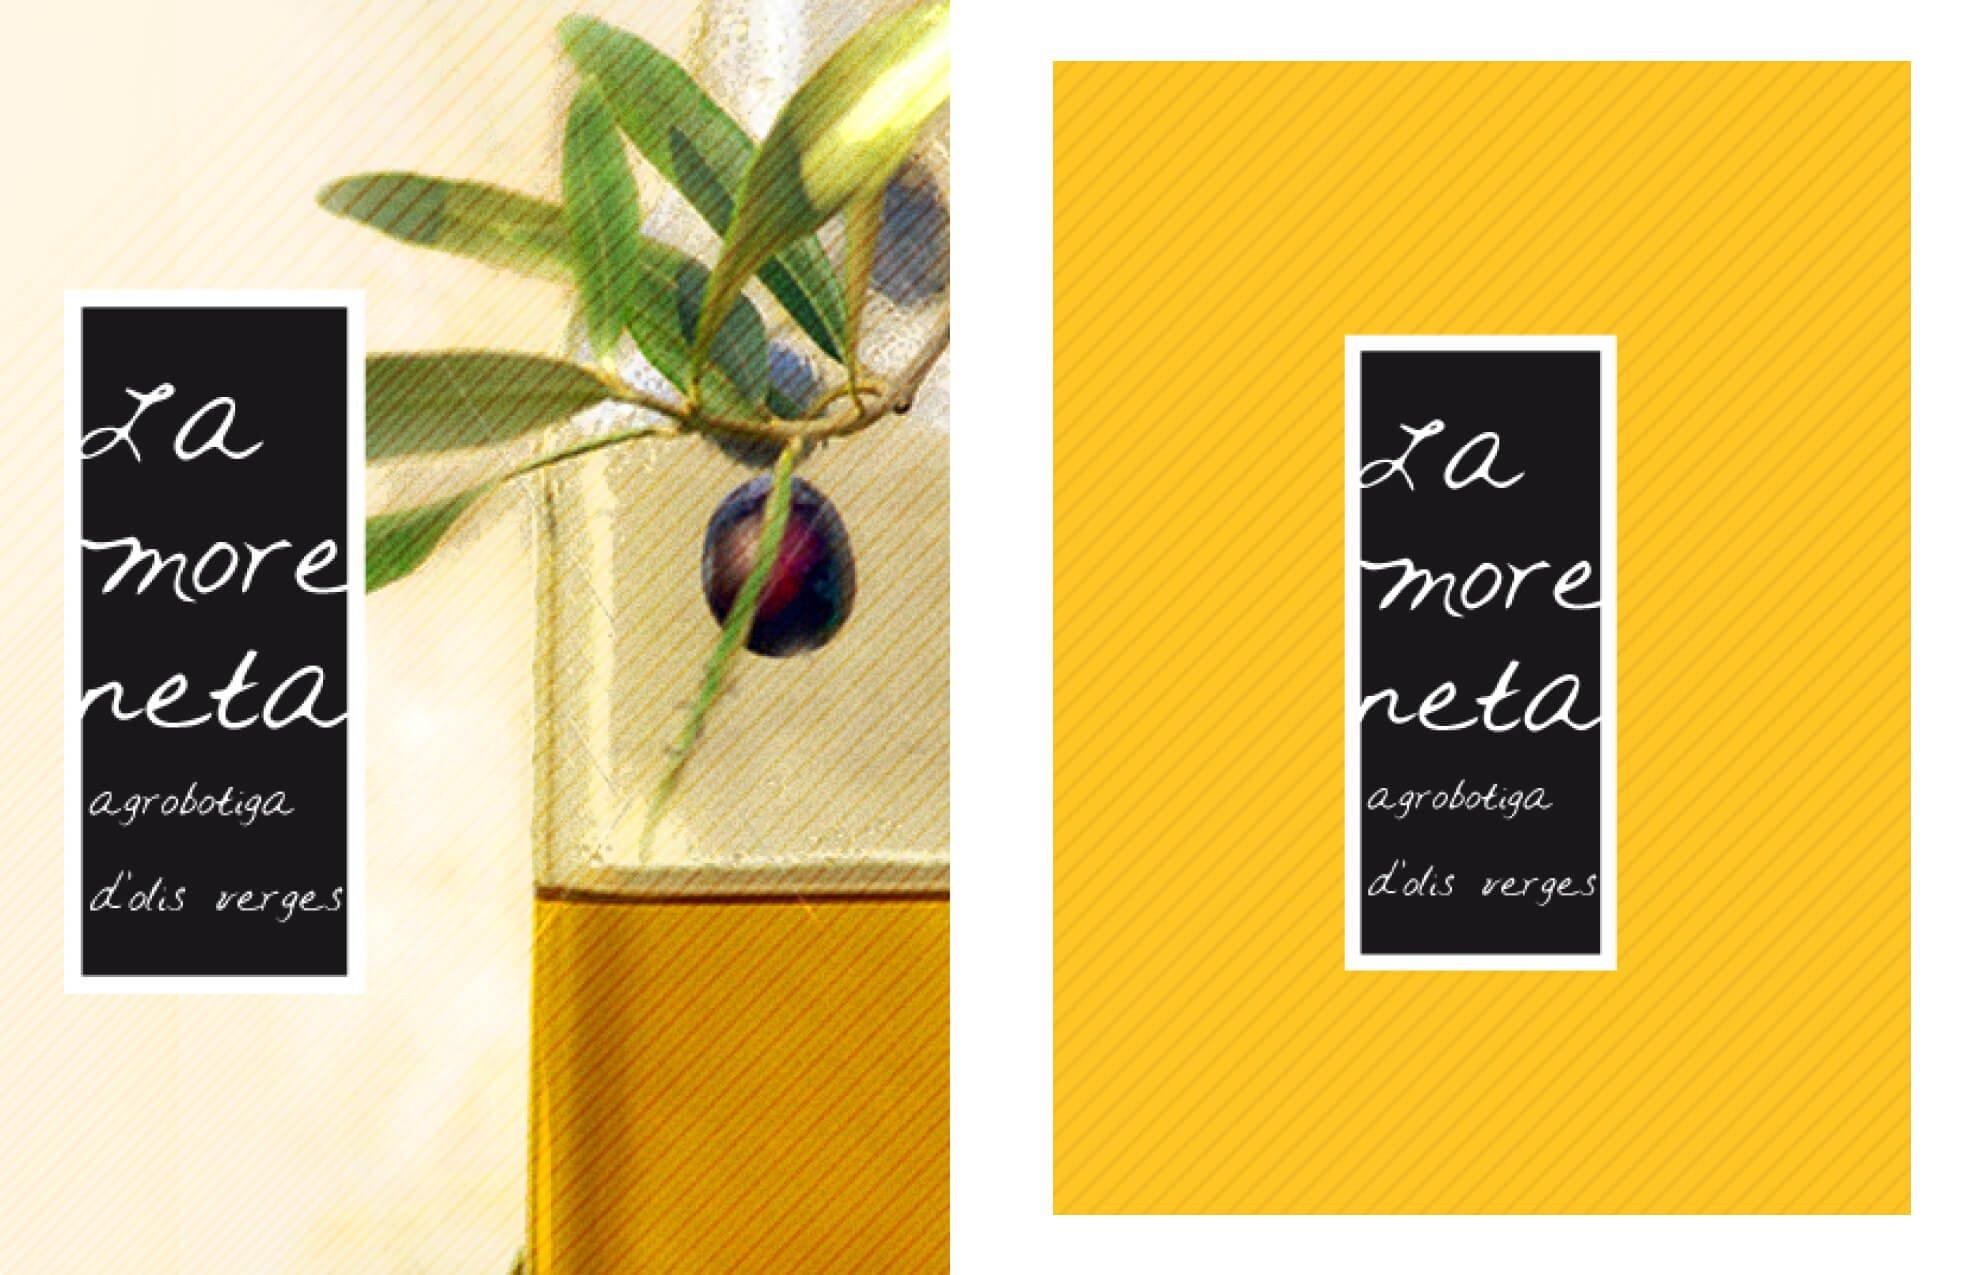 Branding agrobotiga barcelona disseny1 - Branding. Alimentario. Agrobotiga